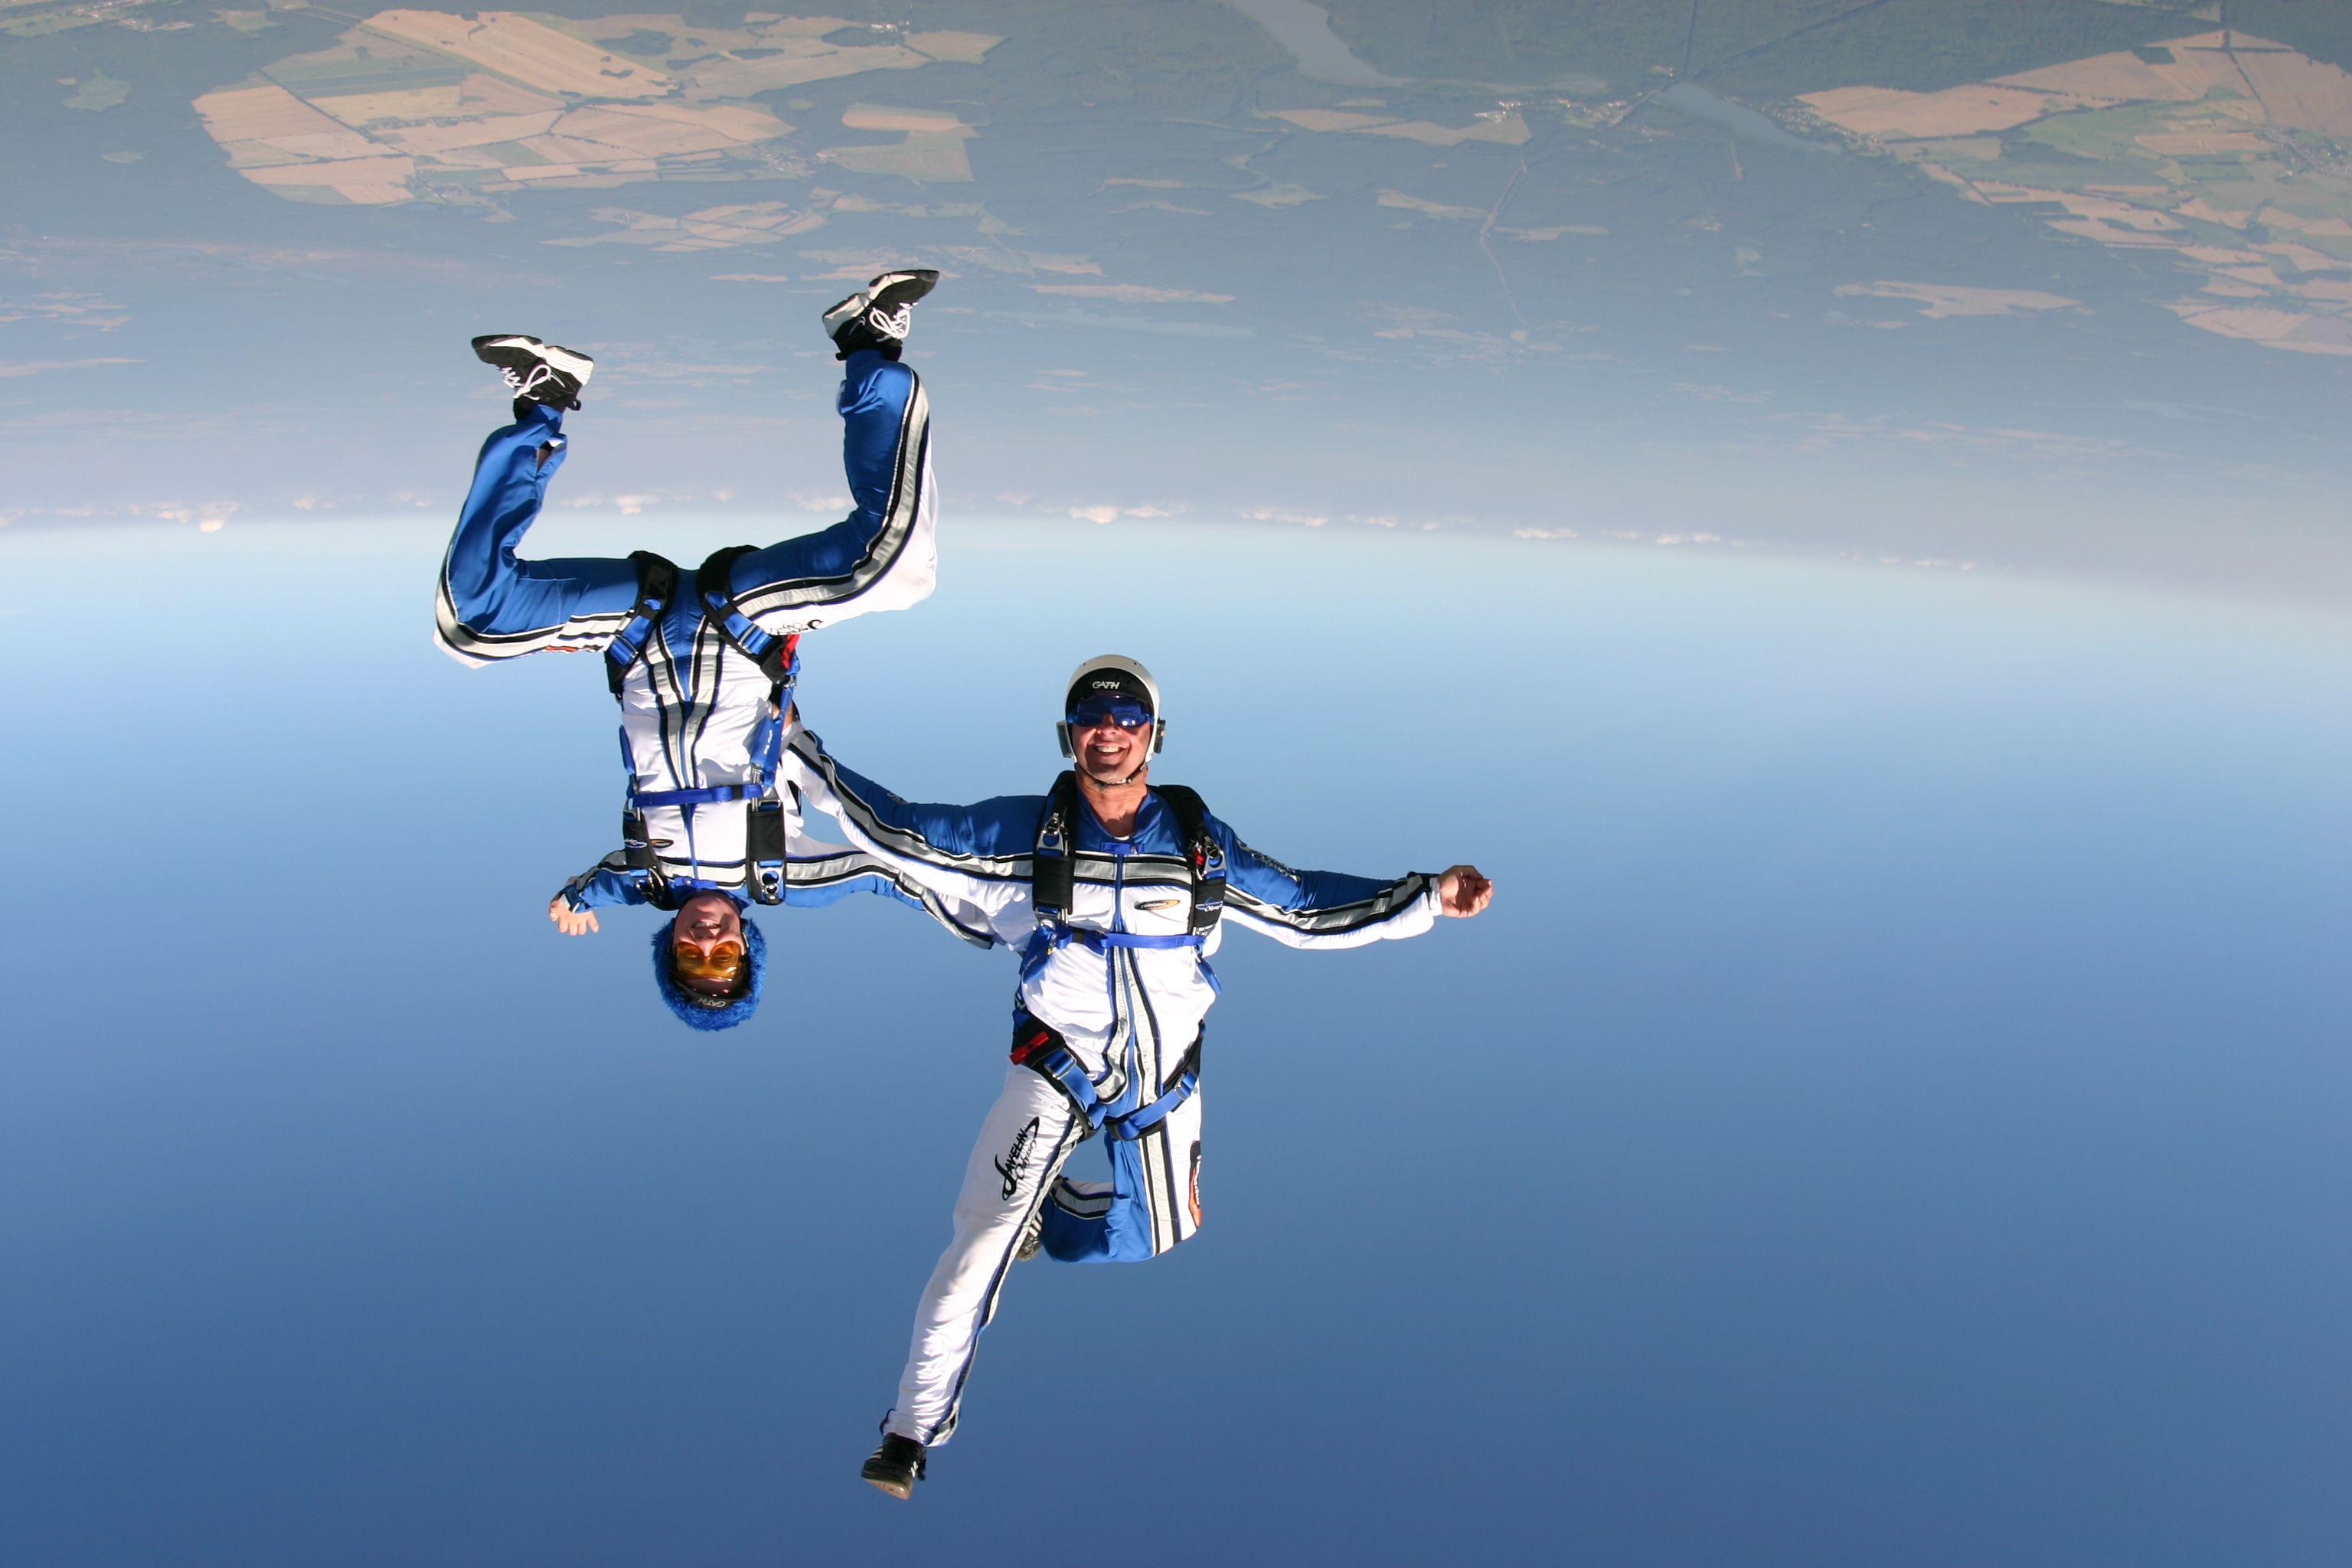 Freestyle Skydiving Skydiving Indoor Skydiving Bungee Jumping